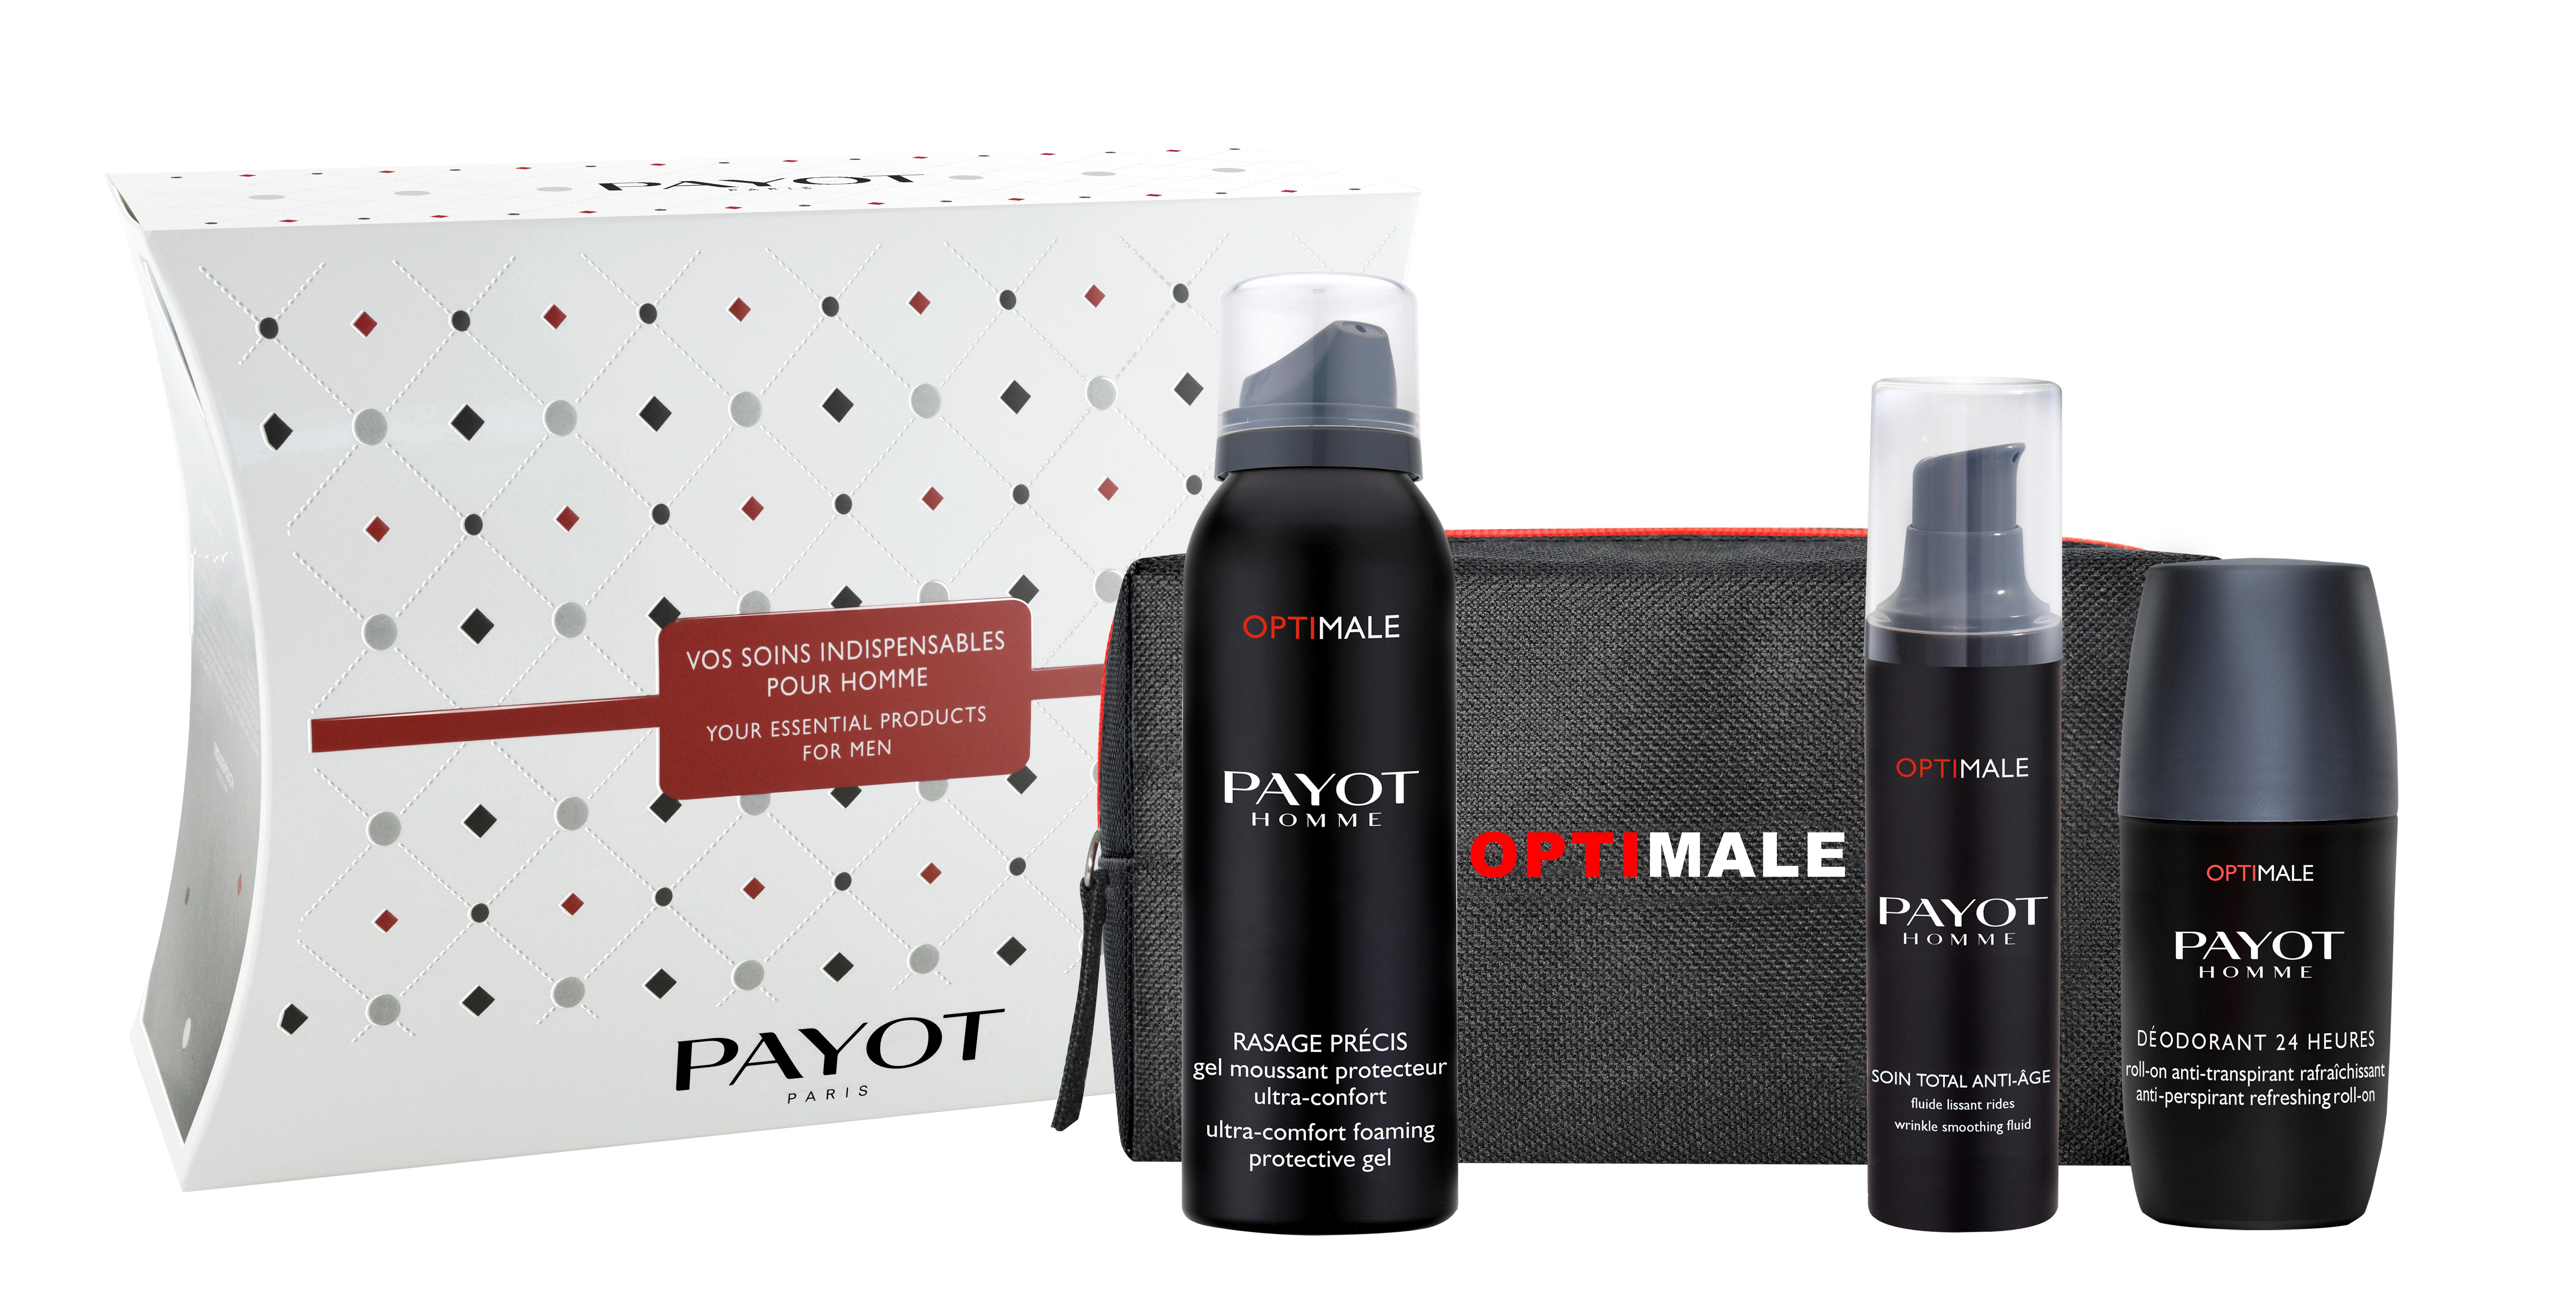 PAYOT Набор подарочный мужской (флюид для разглаживания морщин 50 мл, пена для бритья 100 мл, дезодорант-ролик 75 мл, имиджевая косметичка) Optimale